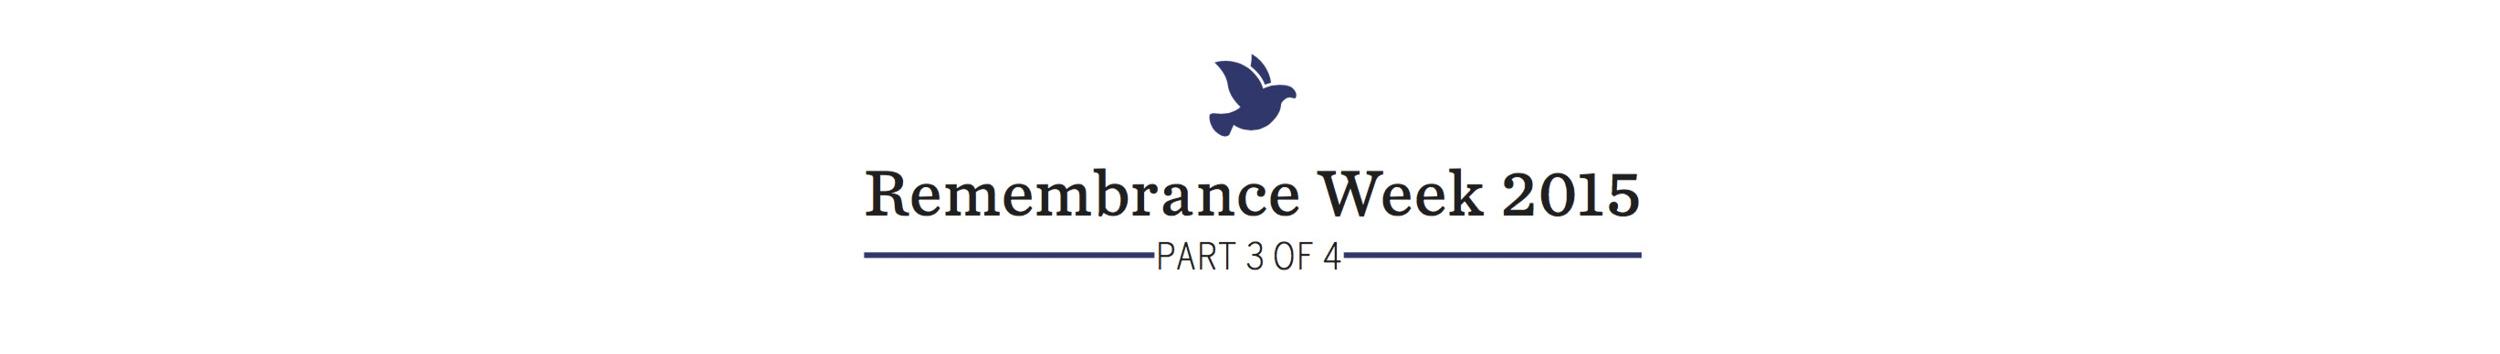 RemembranceBranding3